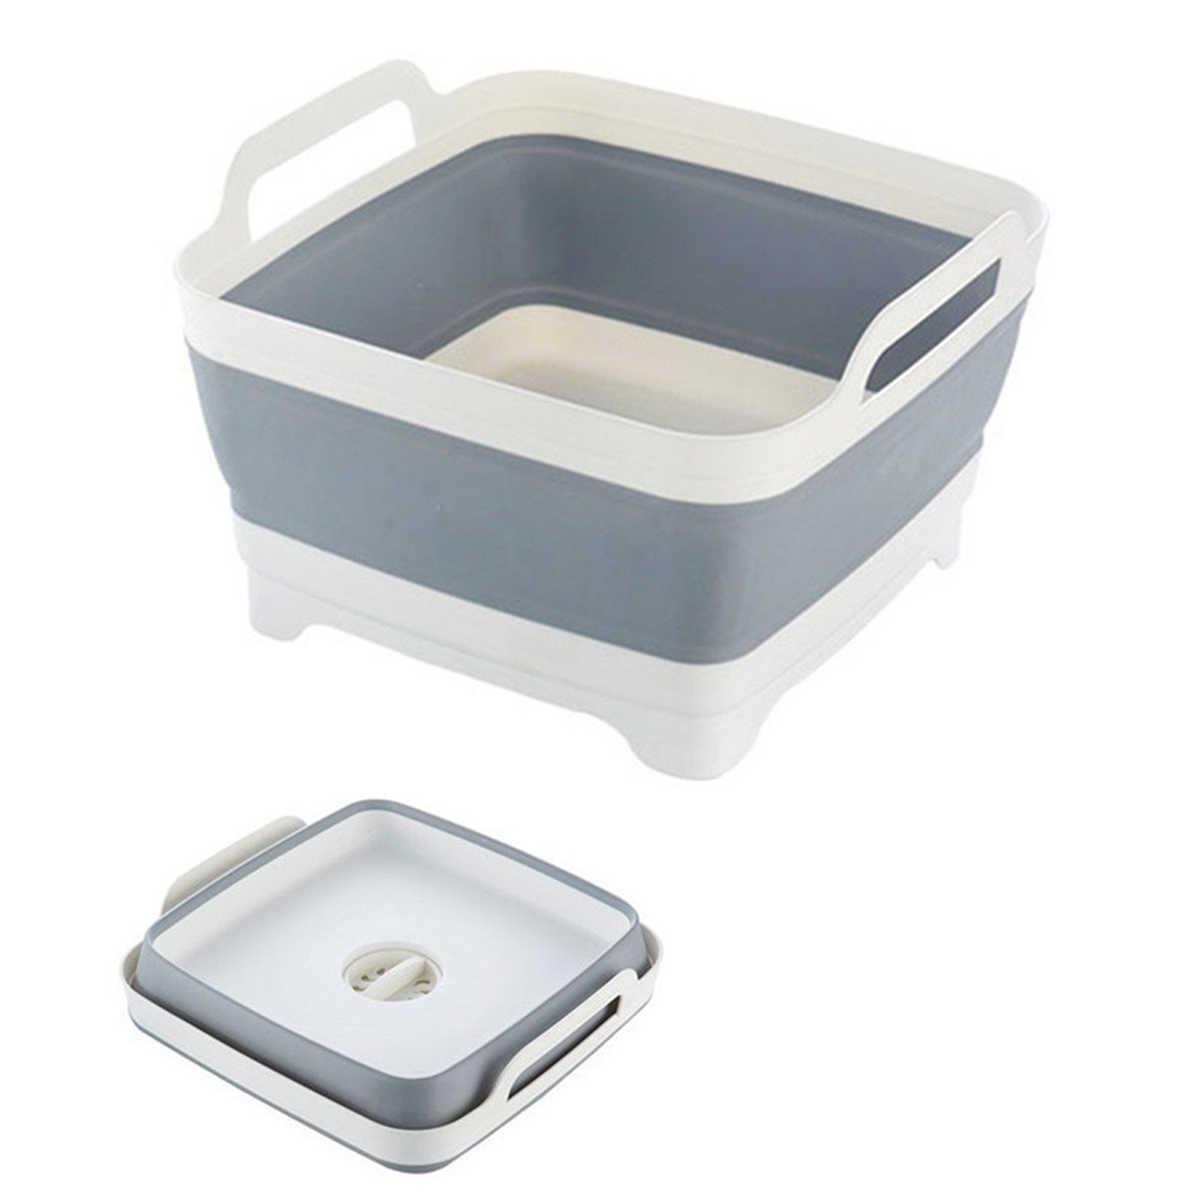 Collapsible Foldable Washing Basin Silicone Camping Dish Tub Portable Travel